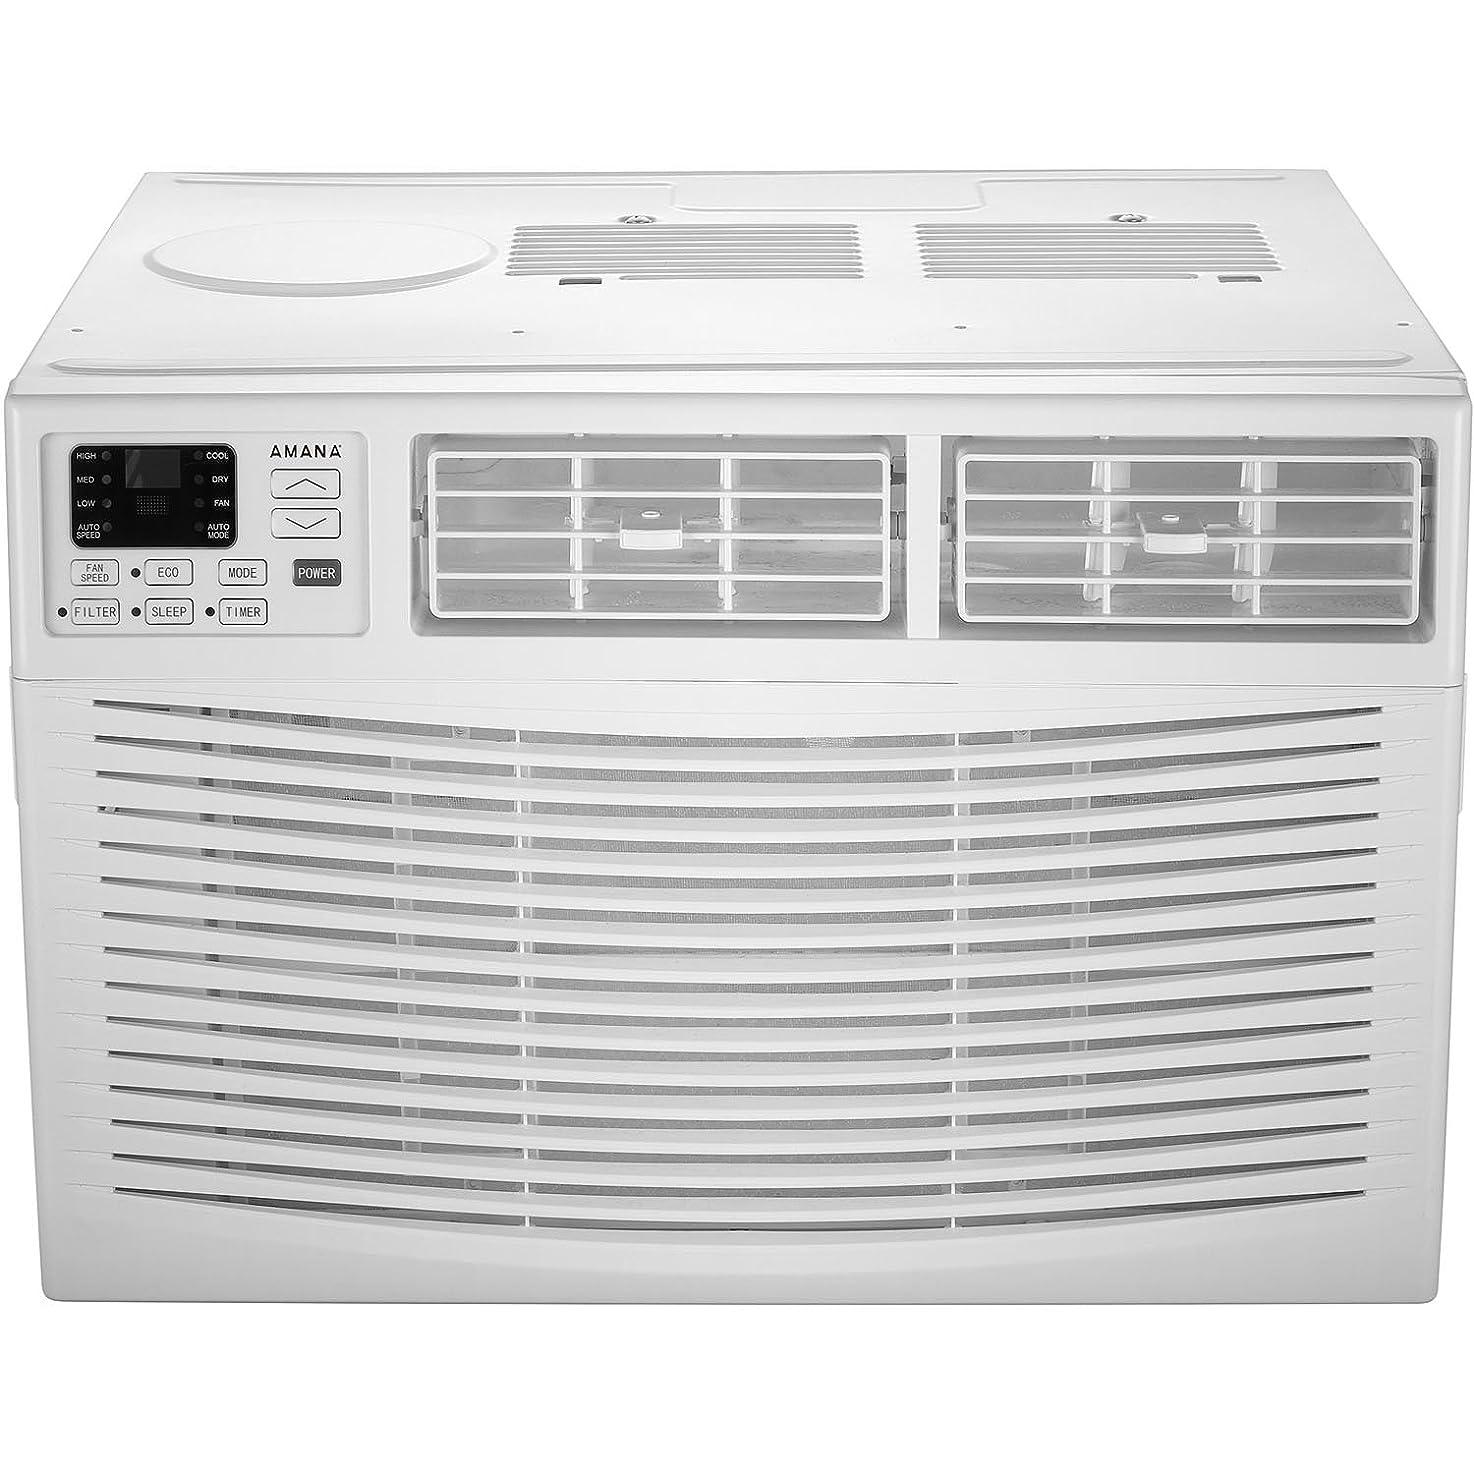 Amana 24,000 BTU 230V Window-Mounted Air Conditioner with Remote Control, White shjkvgqychqso9